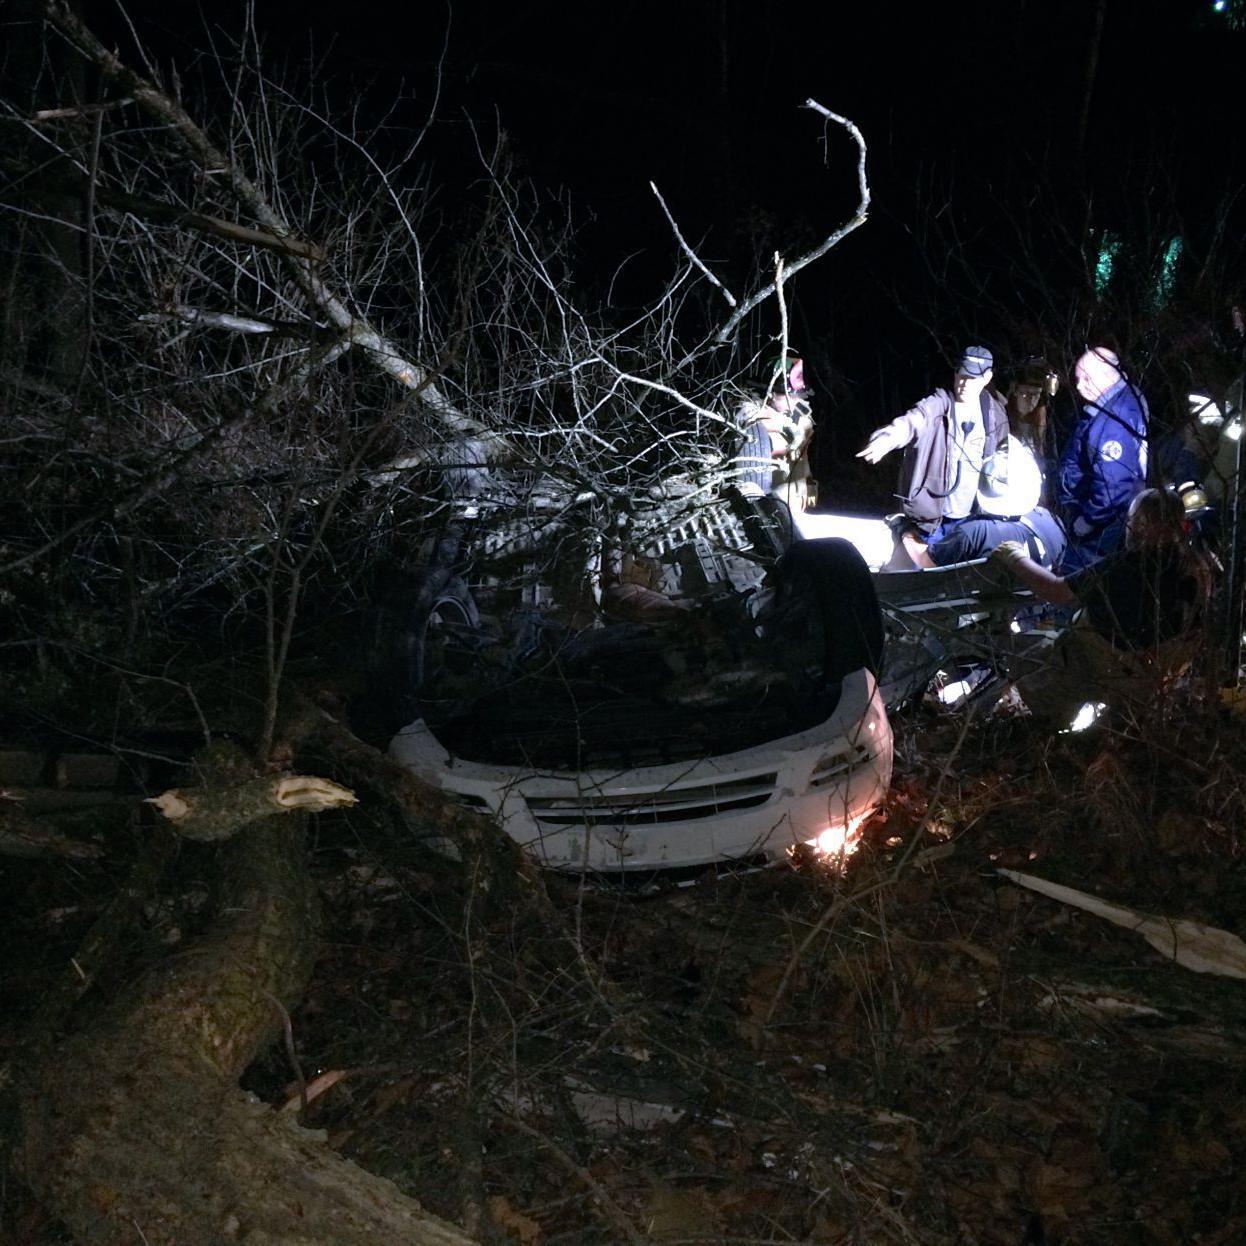 Identities released in Dec  19 quadruple fatal wreck   WV